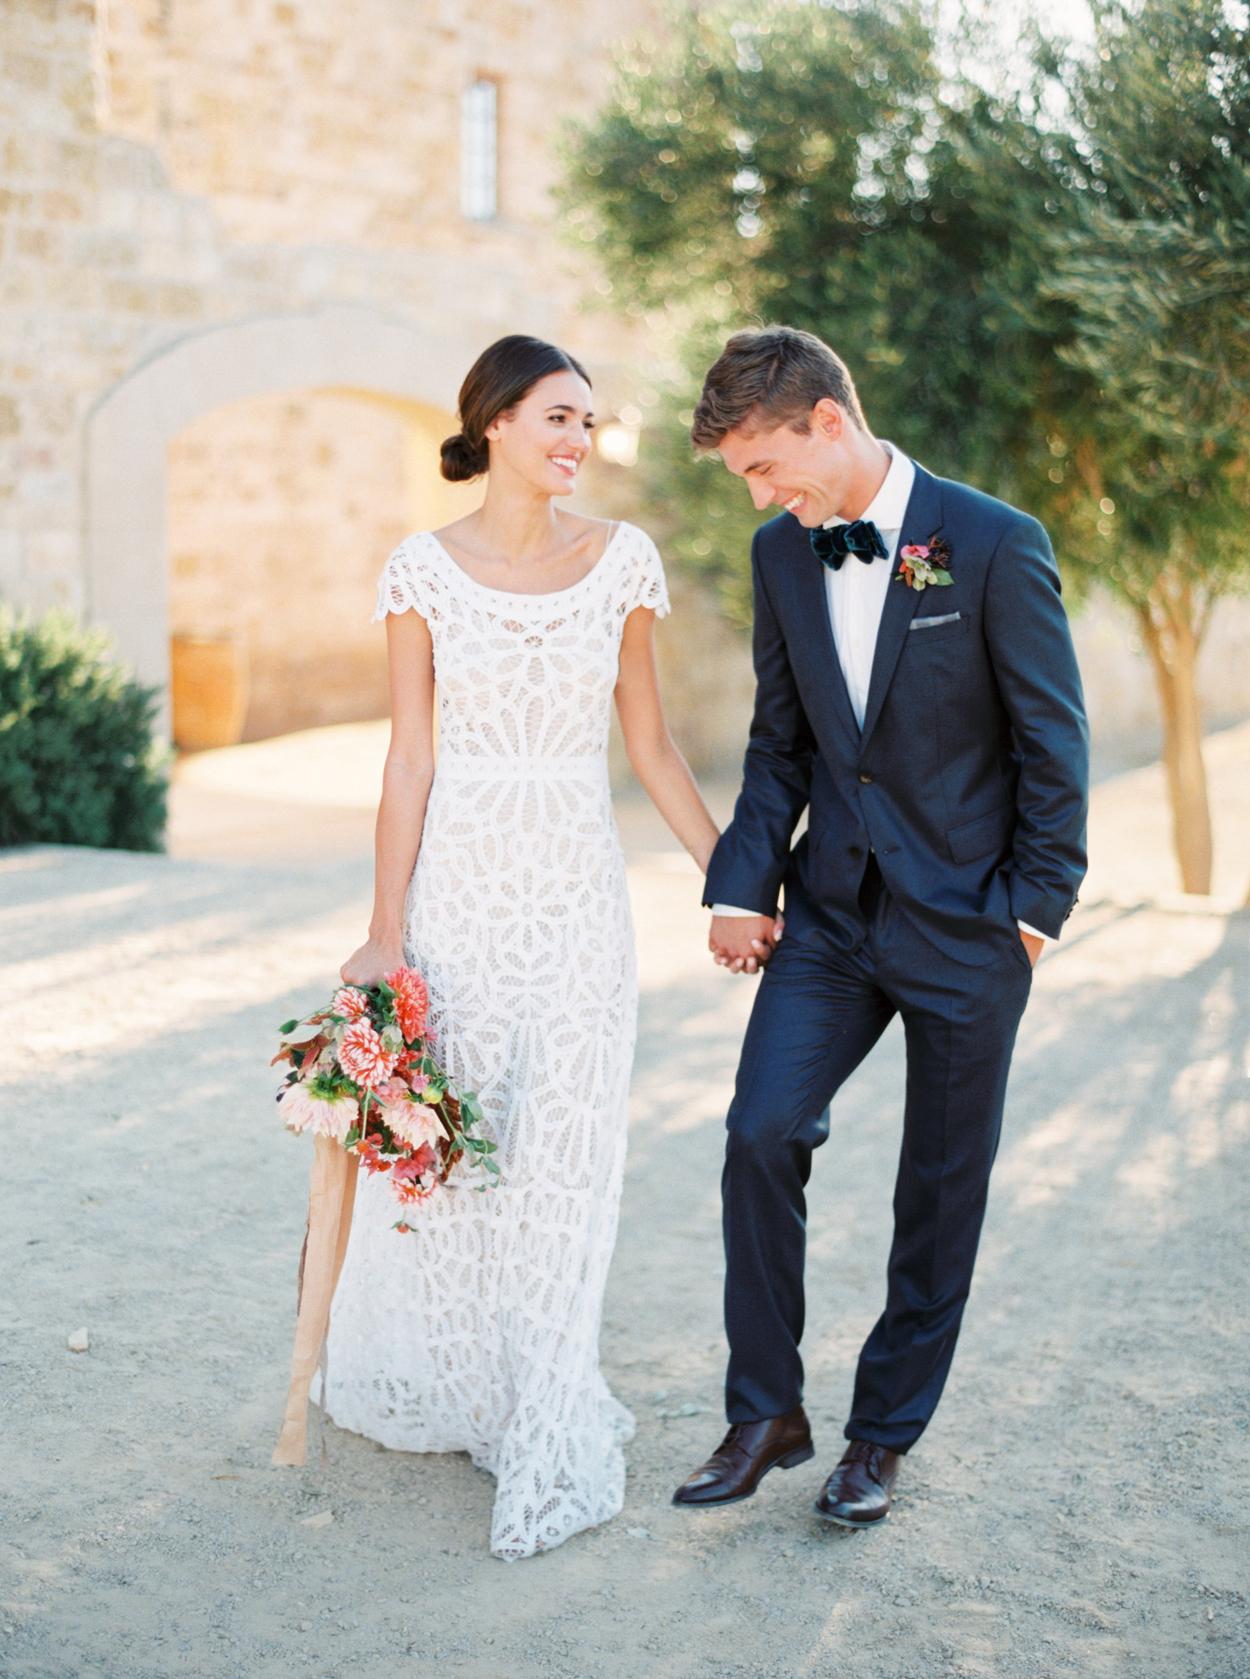 bride wearing lace cap sleeve wedding dress